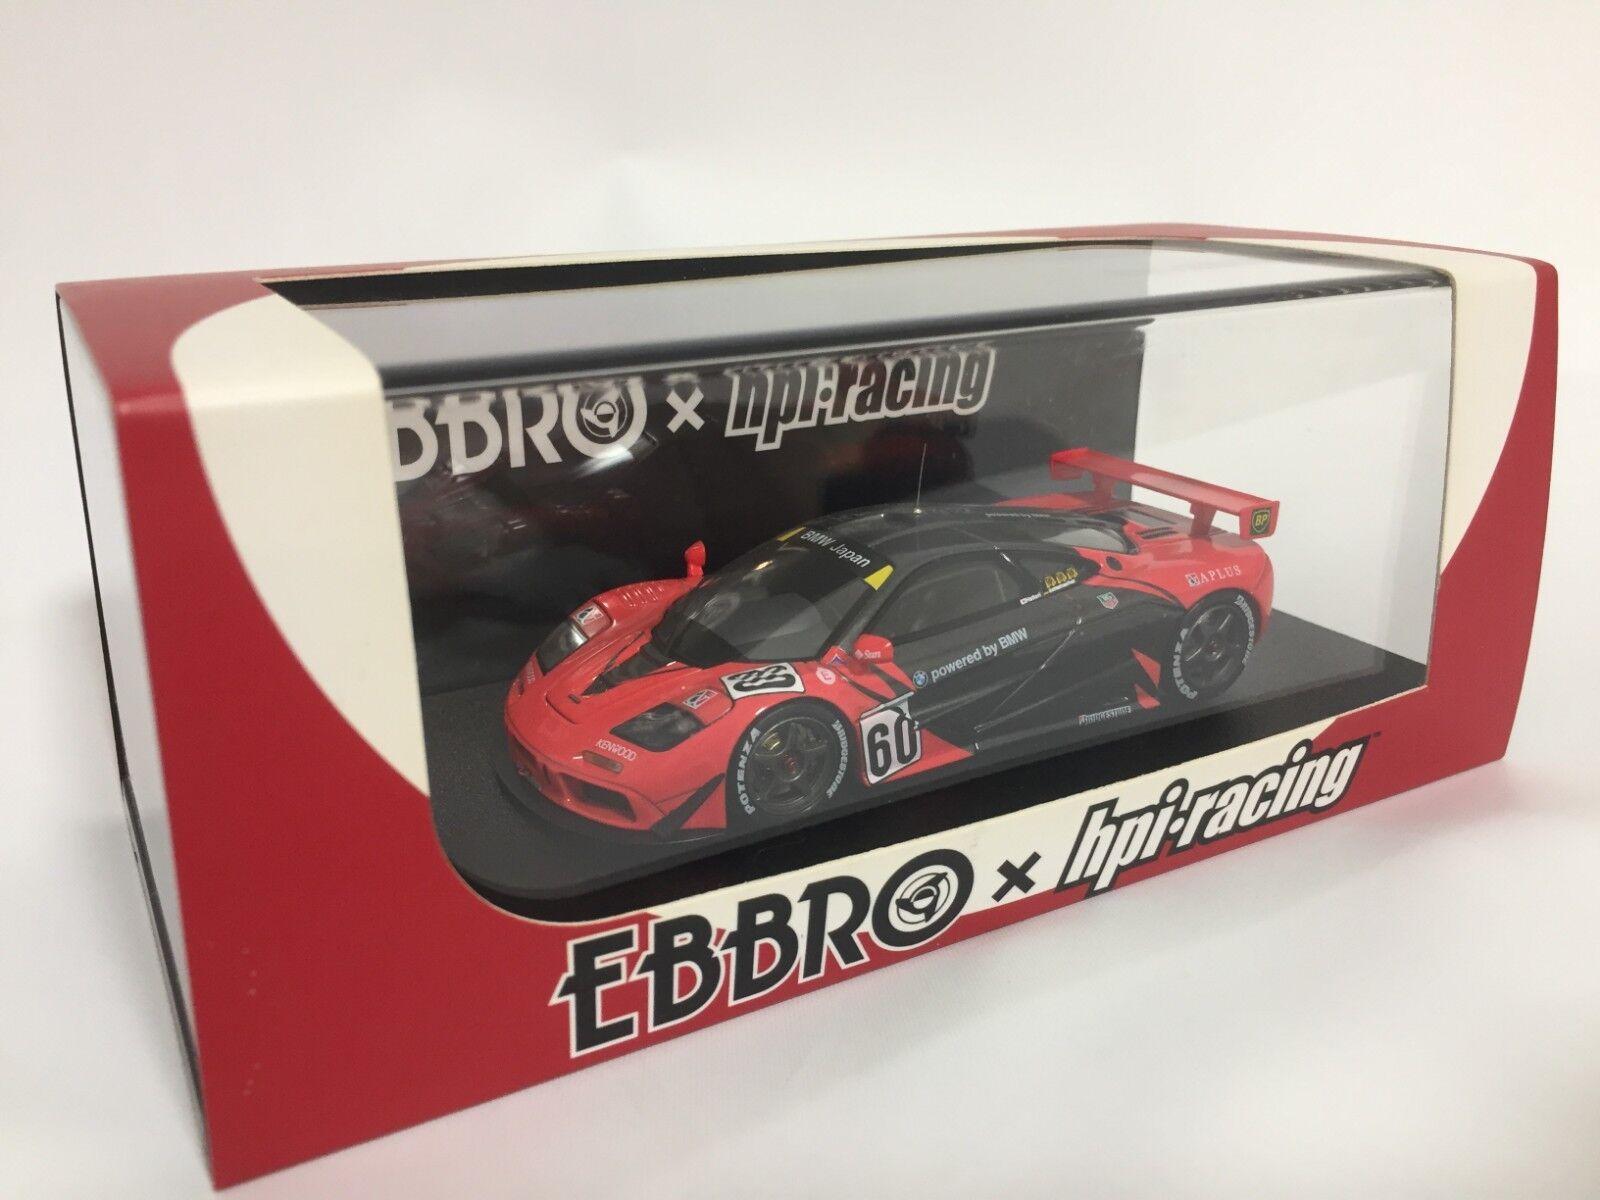 EBBRO 8537 EBBRO x HPI (Go for it Japan ) McLaren F1 GTR 1996 JGTC  60 1 43 Scale